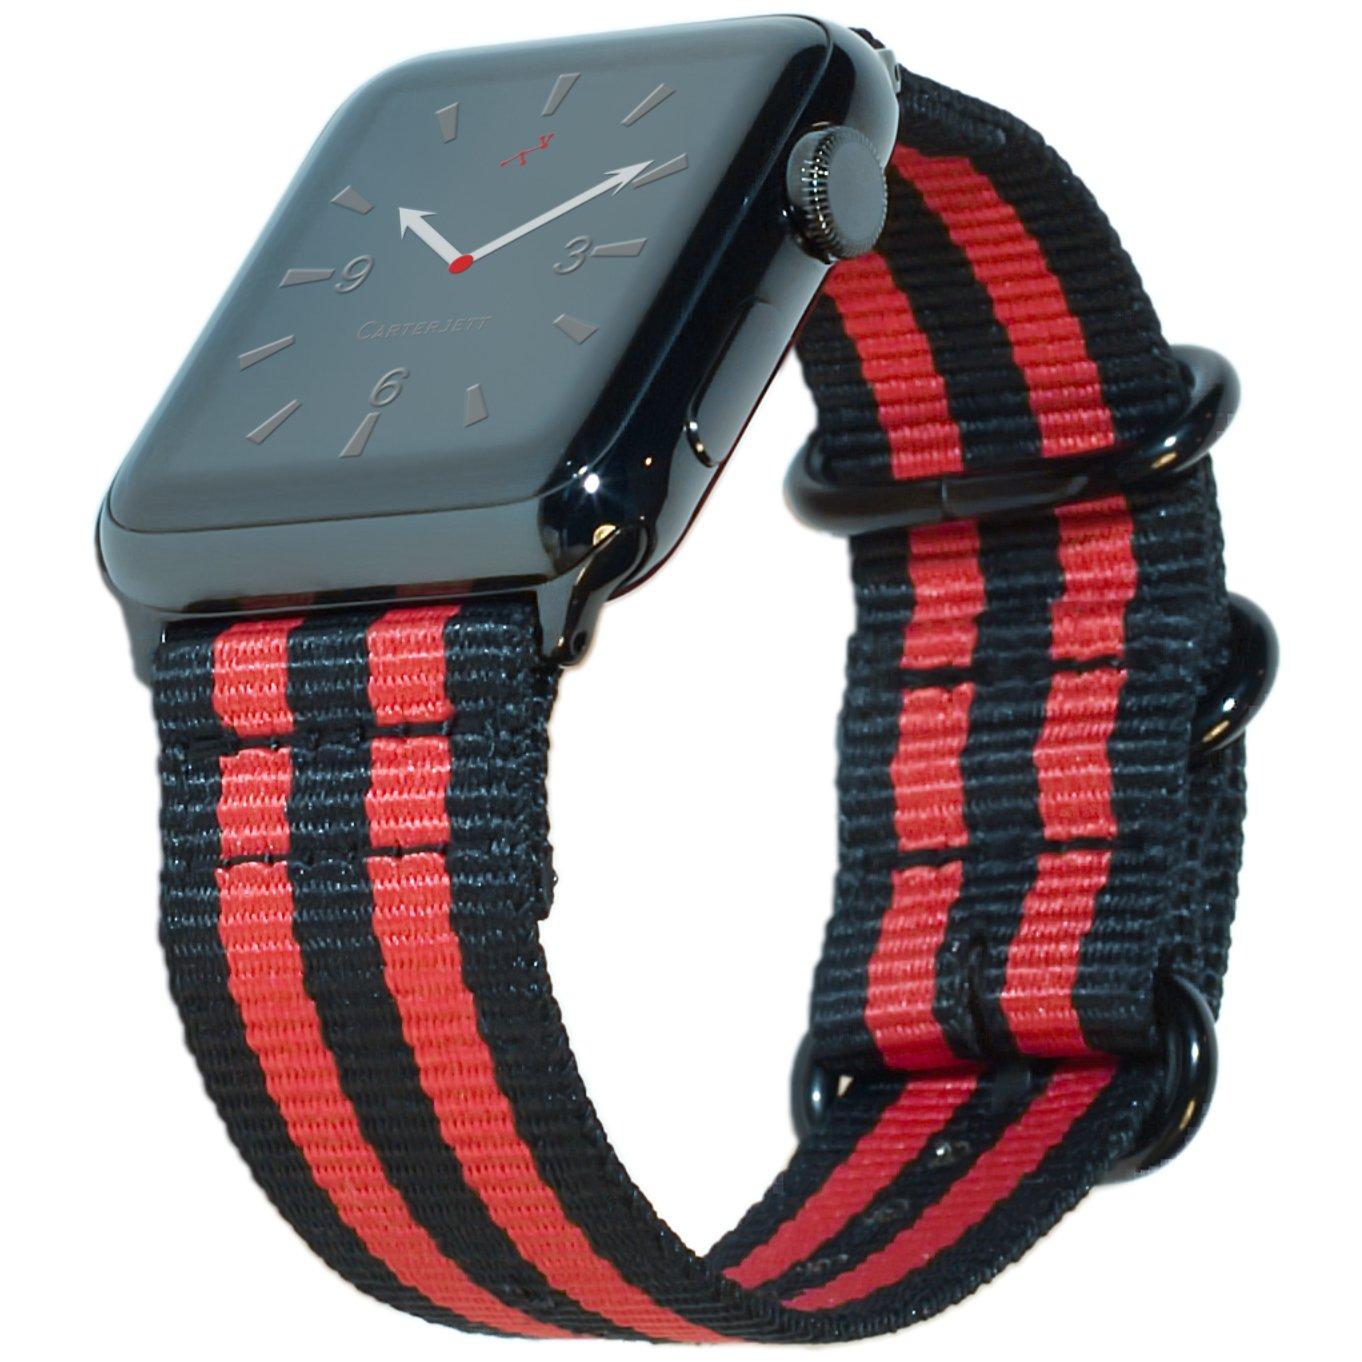 Malla Nylon para Apple Watch (42/44mm) CARTERJETT [7321FF4N]